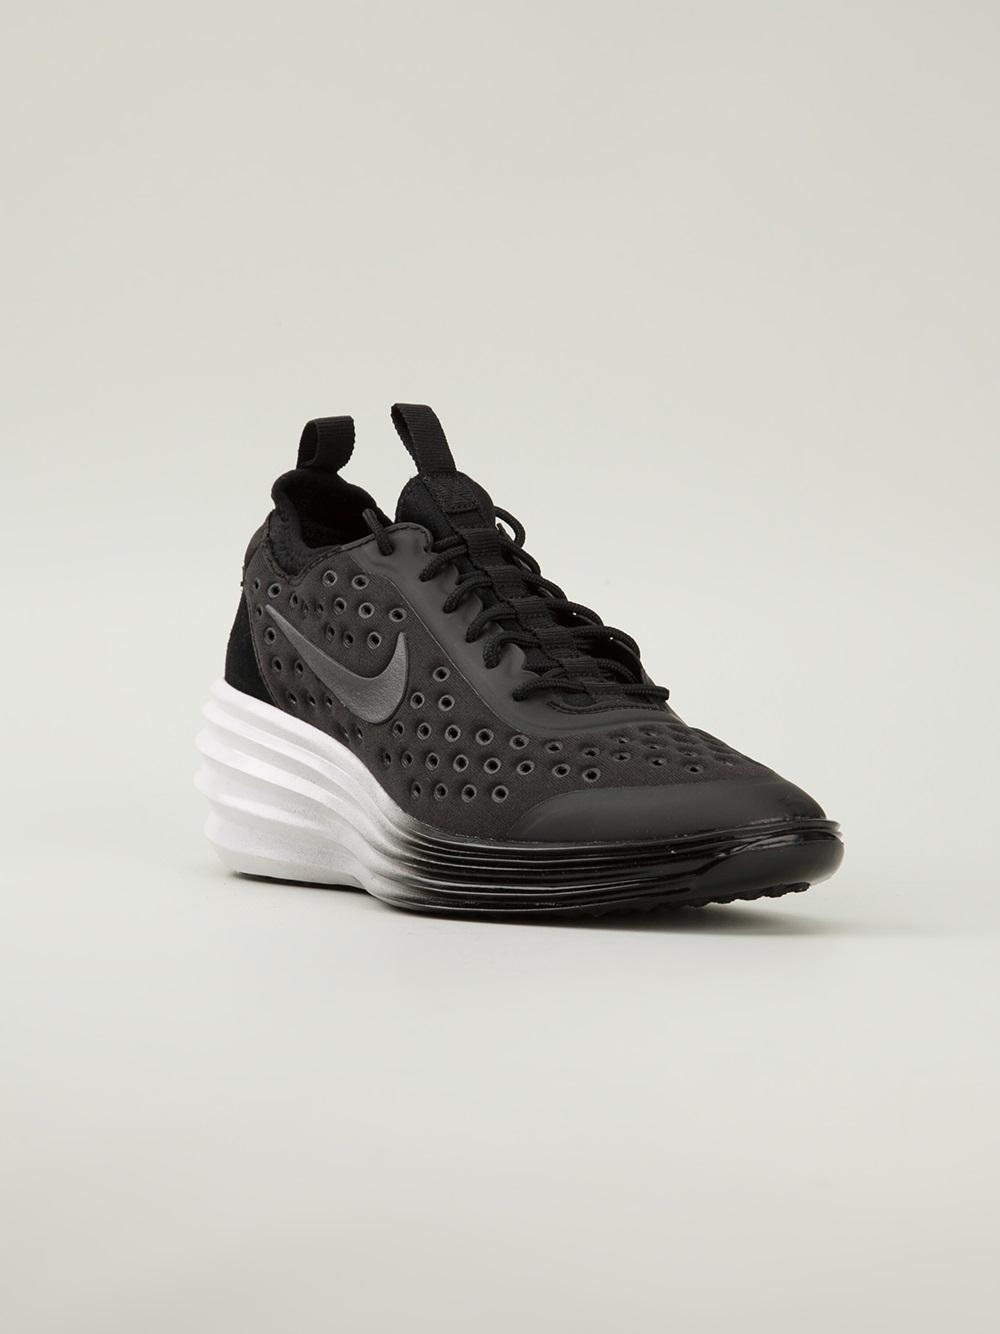 online store 5a703 12379 Nike Lunarelite Sky Hi Trainers in Black - Lyst